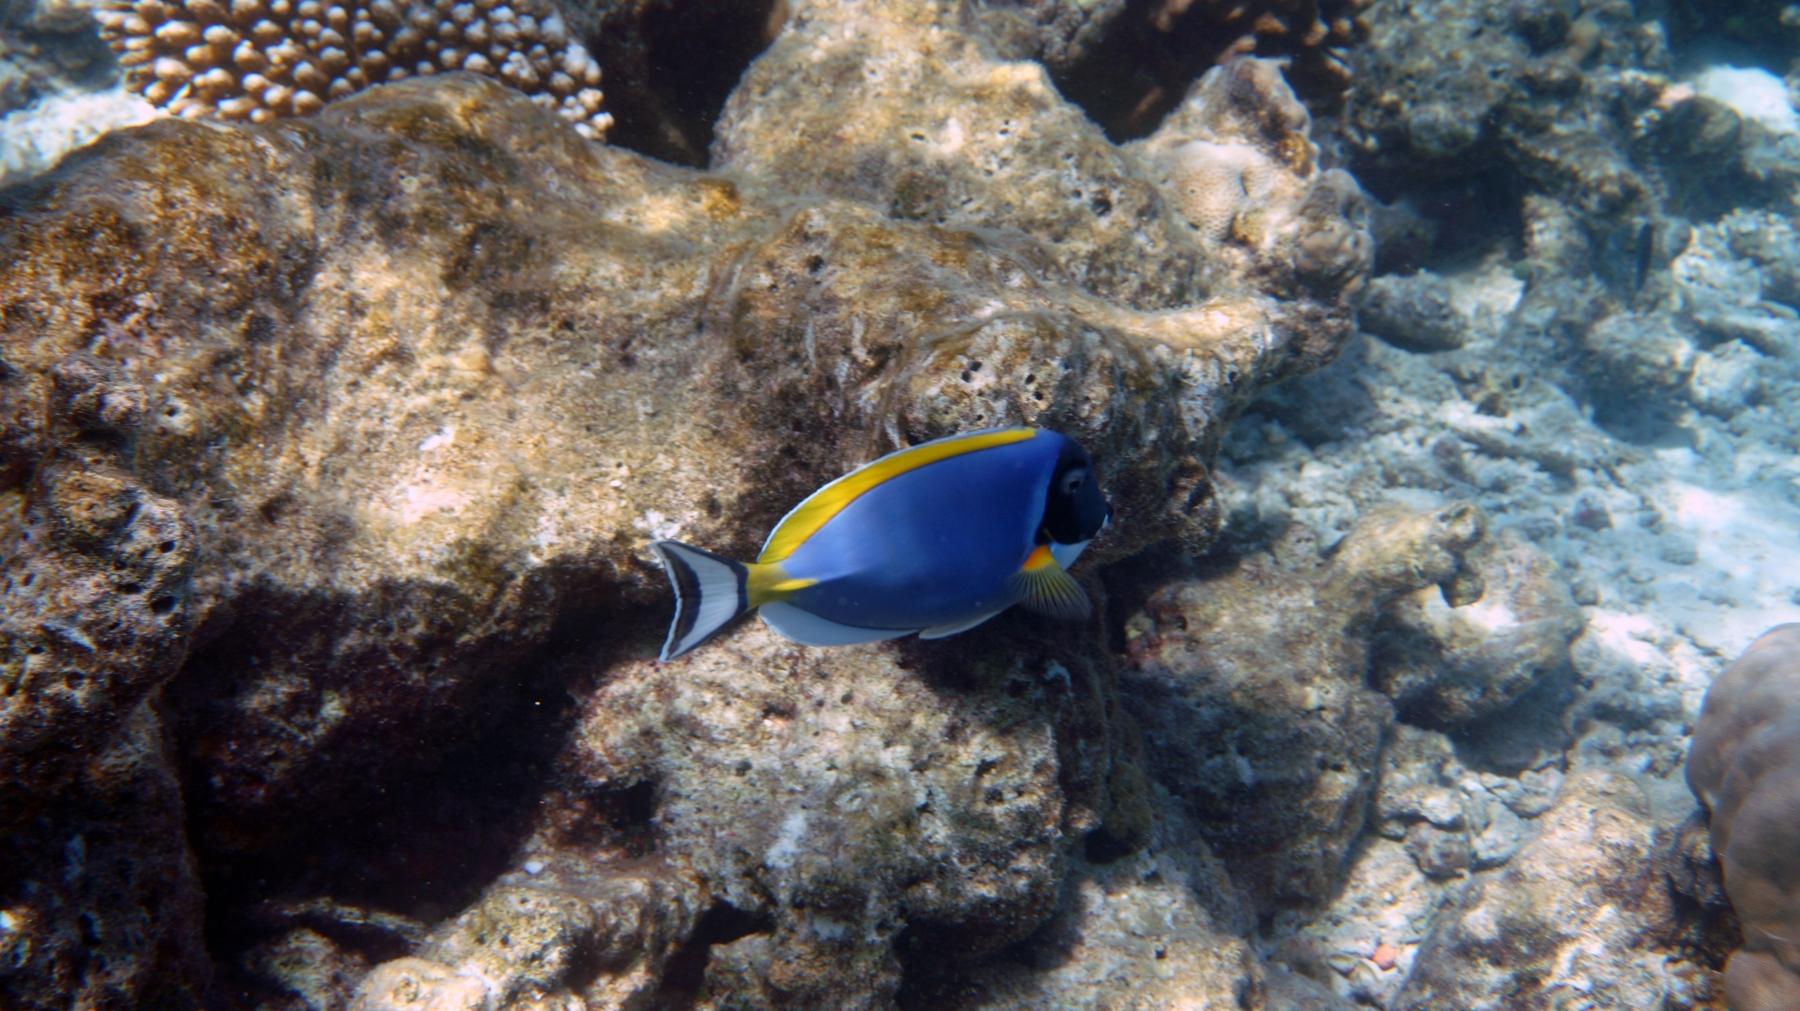 Acanthurus_leucosternon_007_C_Peces-Cirujano_L_Maldivas_U_Sebas_03072015